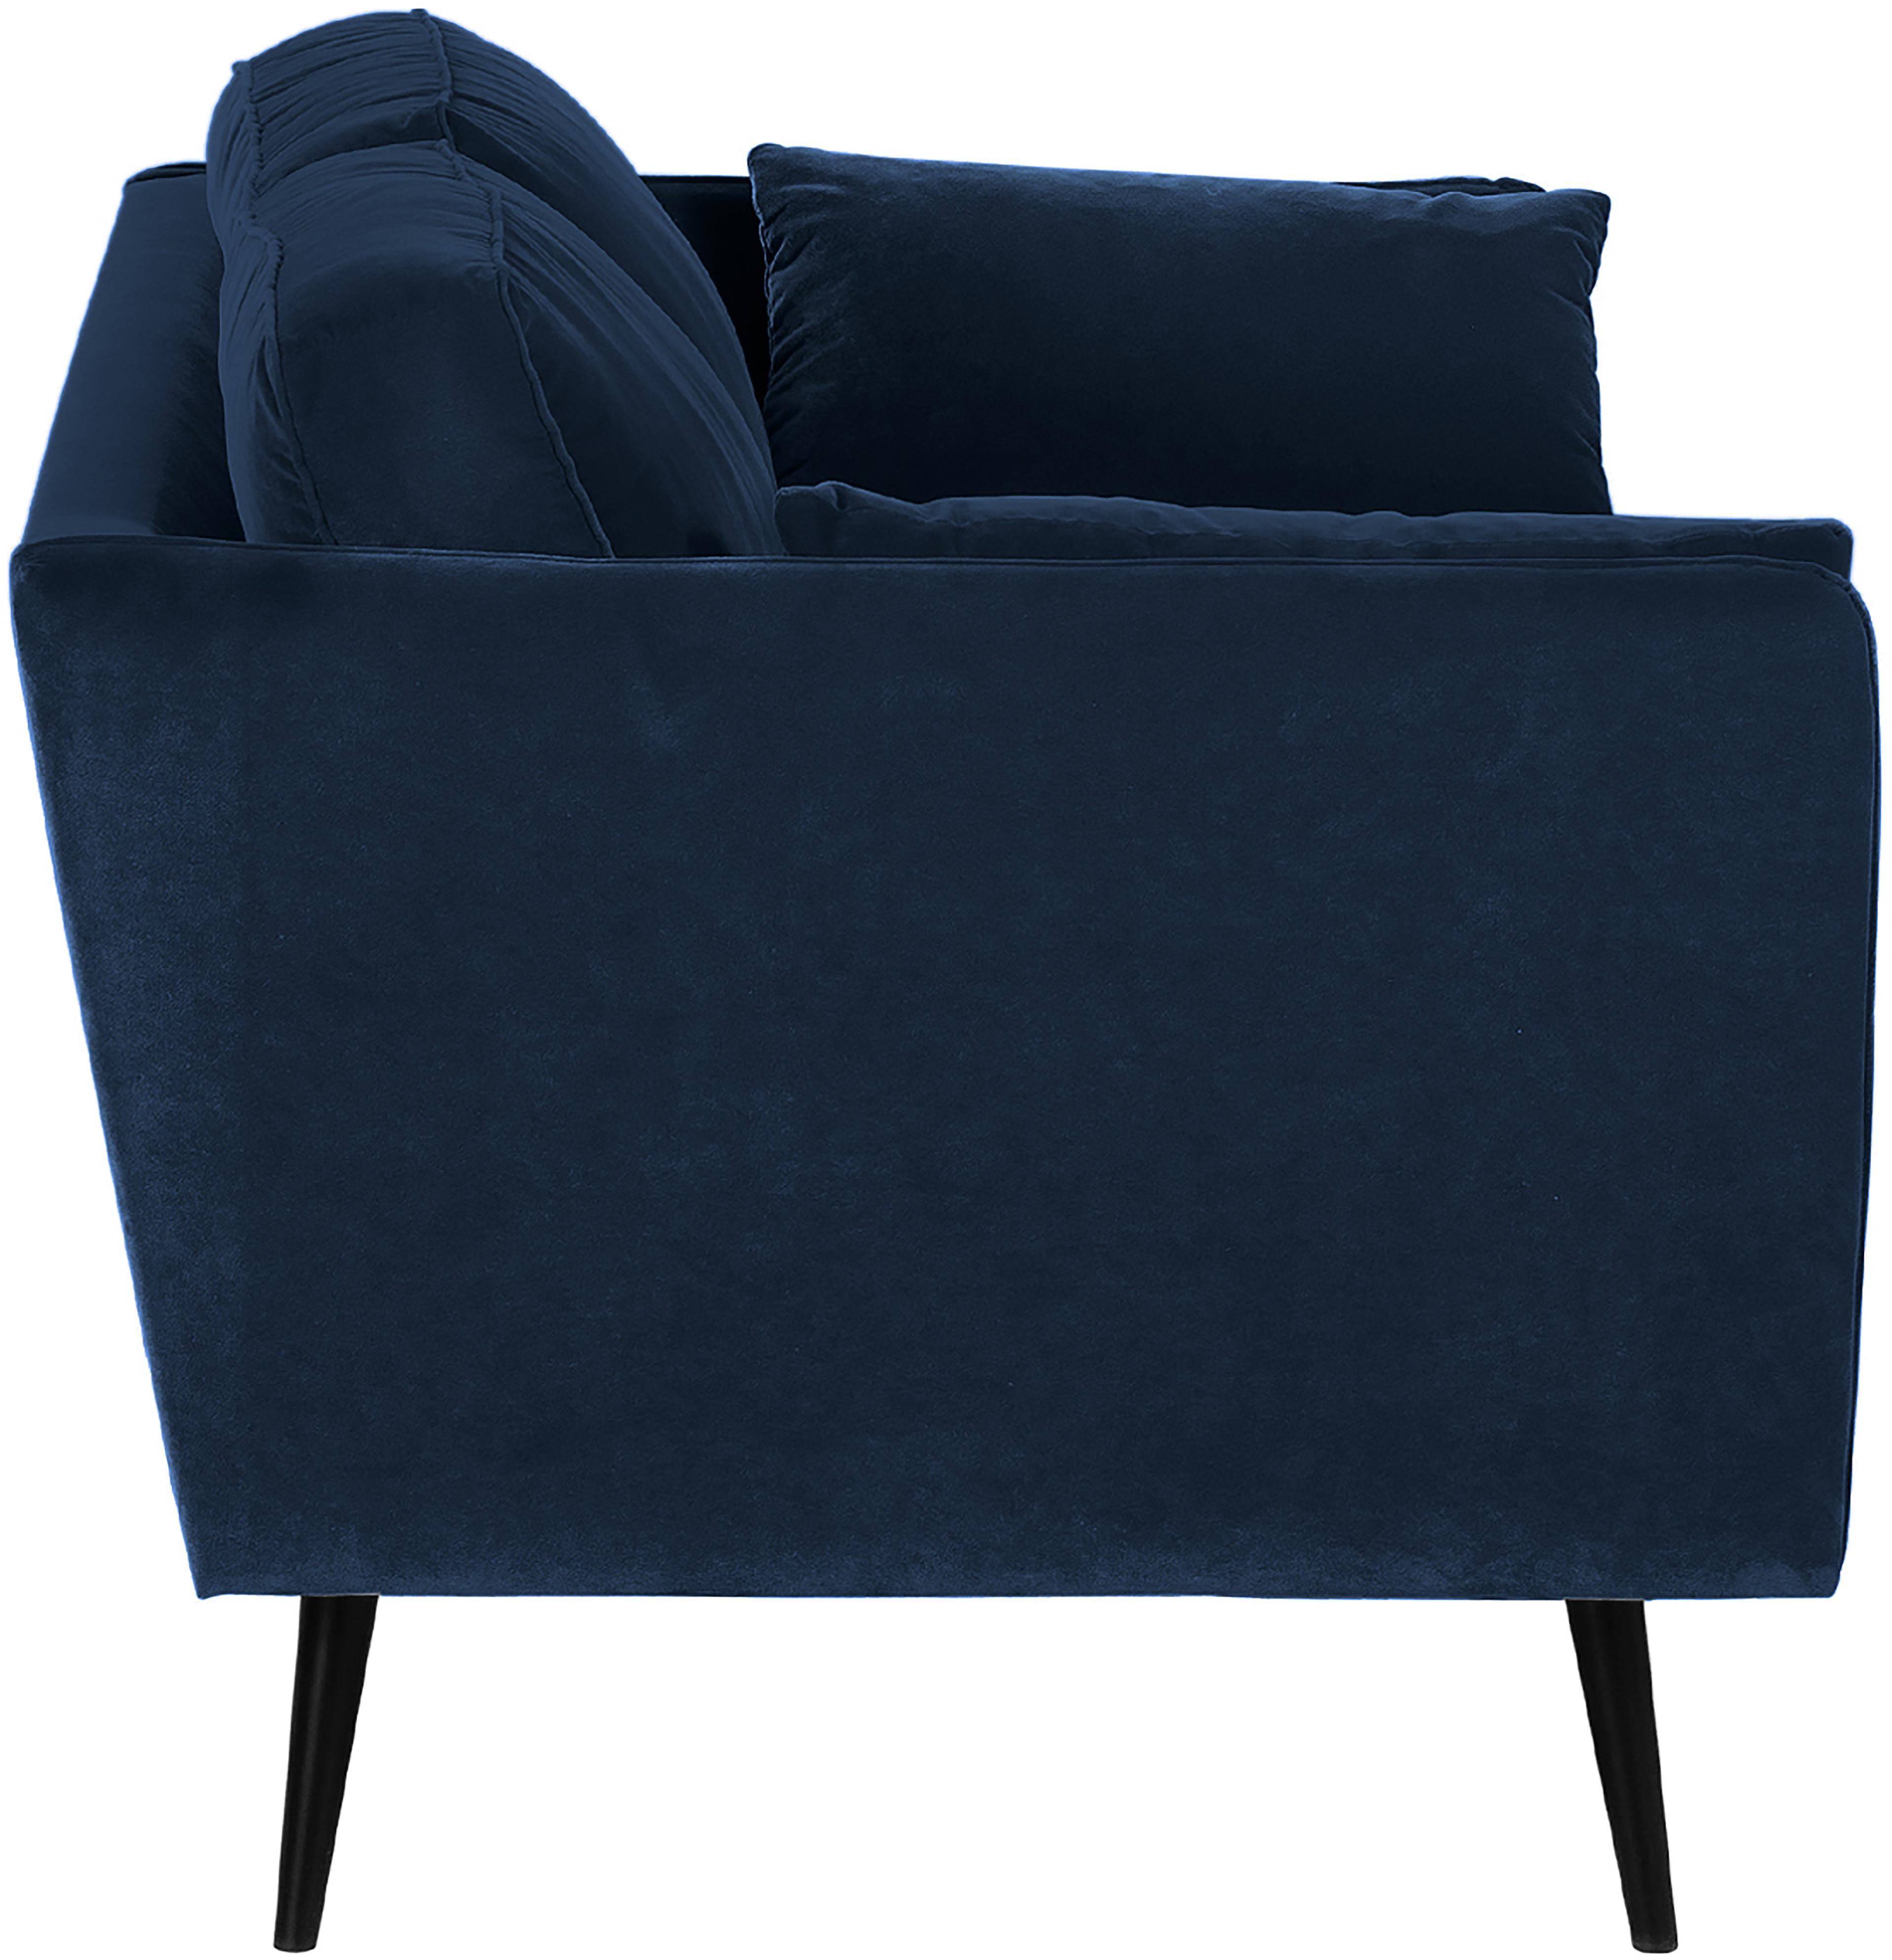 Samt-Sofa Paola (2-Sitzer), Bezug: Samt (Polyester) 70.000 S, Gestell: Massives Fichtenholz, Spa, Füße: Fichtenholz, lackiert, Samt Blau, B 179 x T 95 cm